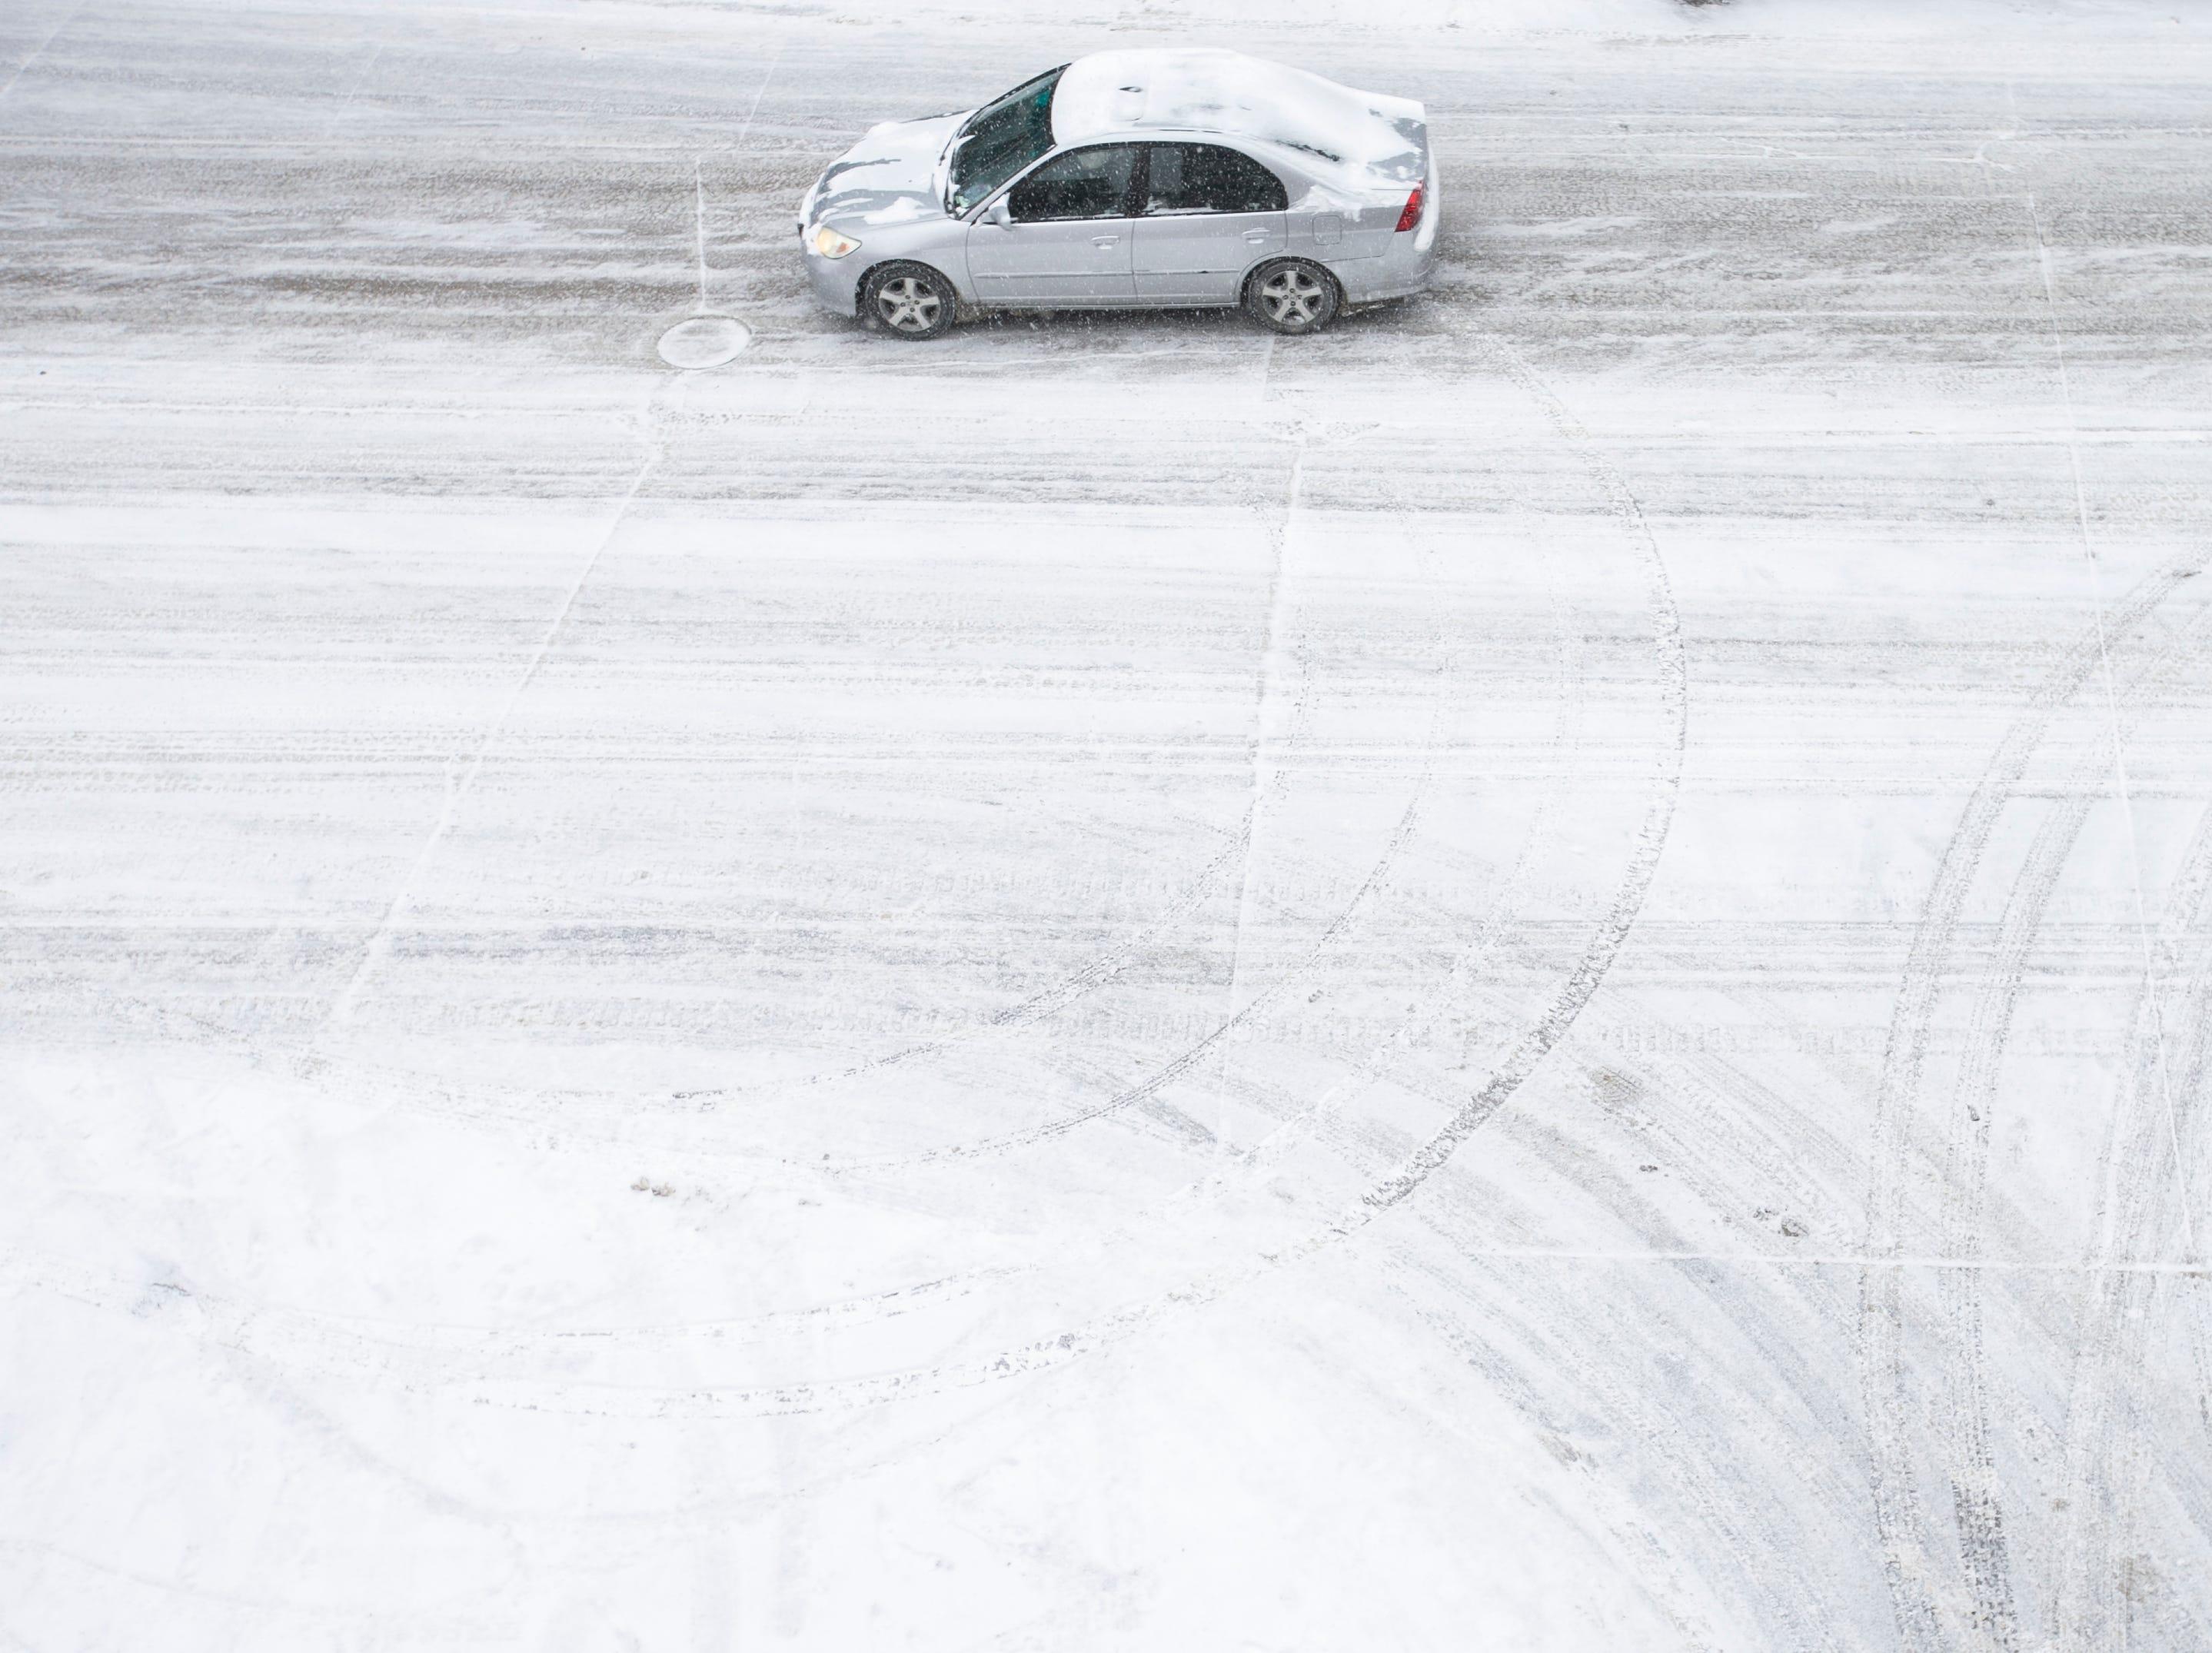 A car drives along Madison Street as snow falls on Thursday, Jan. 31, 2019, in downtown Iowa City, Iowa.